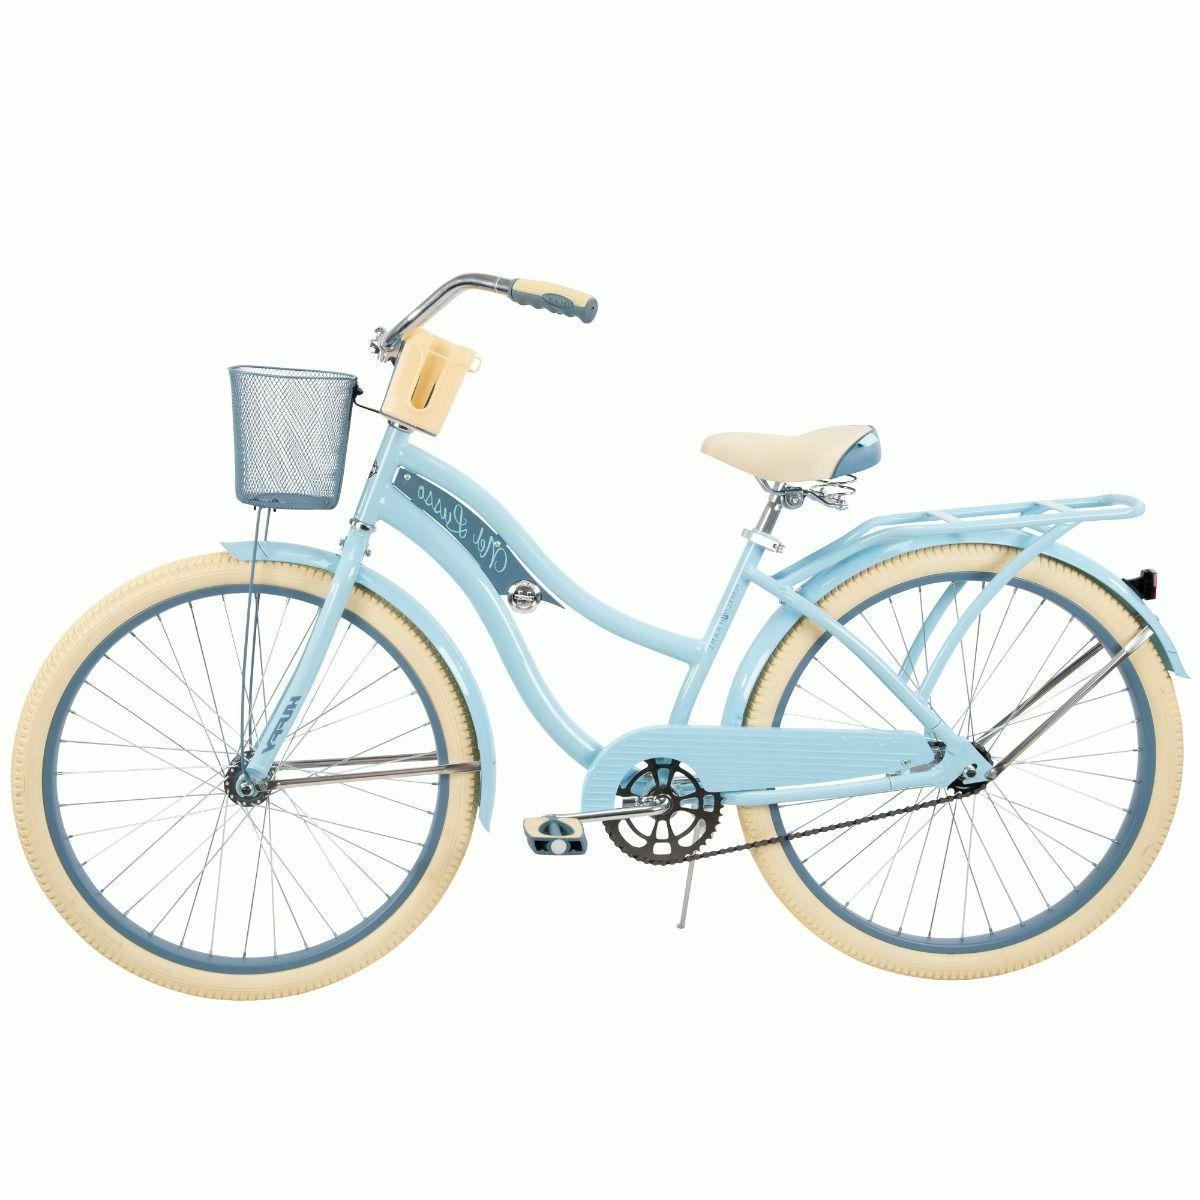 Huffy 26-Inch Nel Lusso Women's Beach Cruiser Bike 56579P7 Blue In-Box